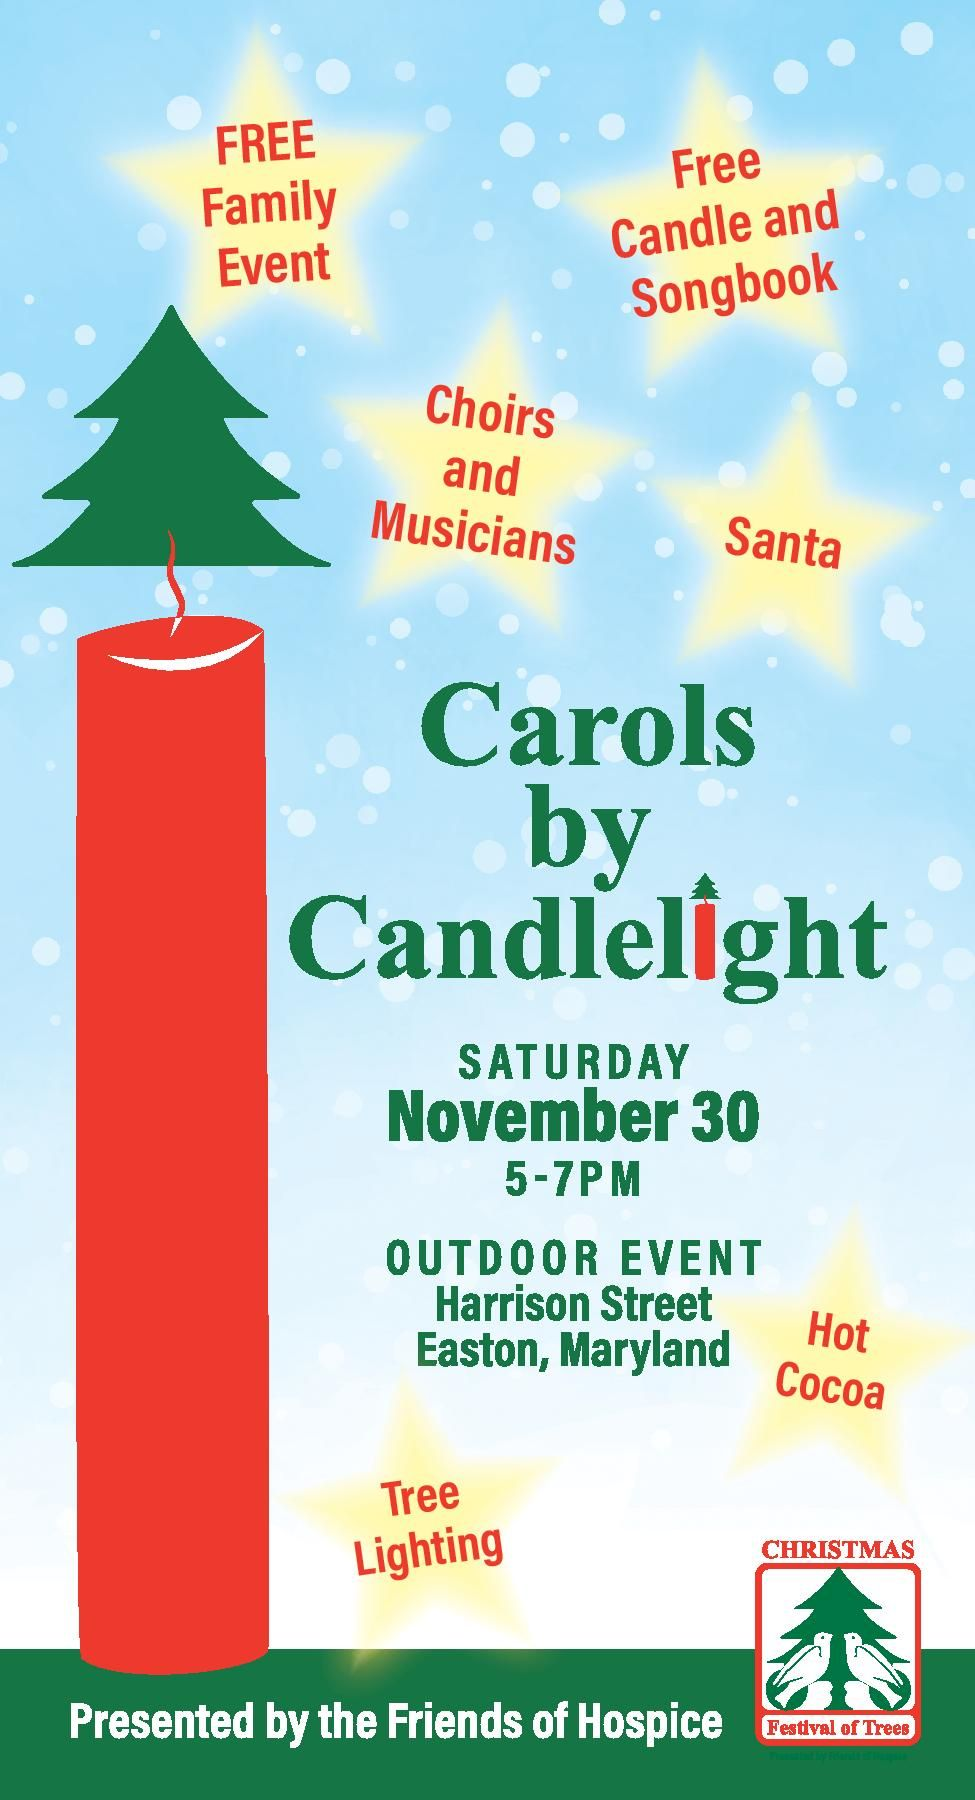 CarolsbyCandlelightHandout-page-001.jpg